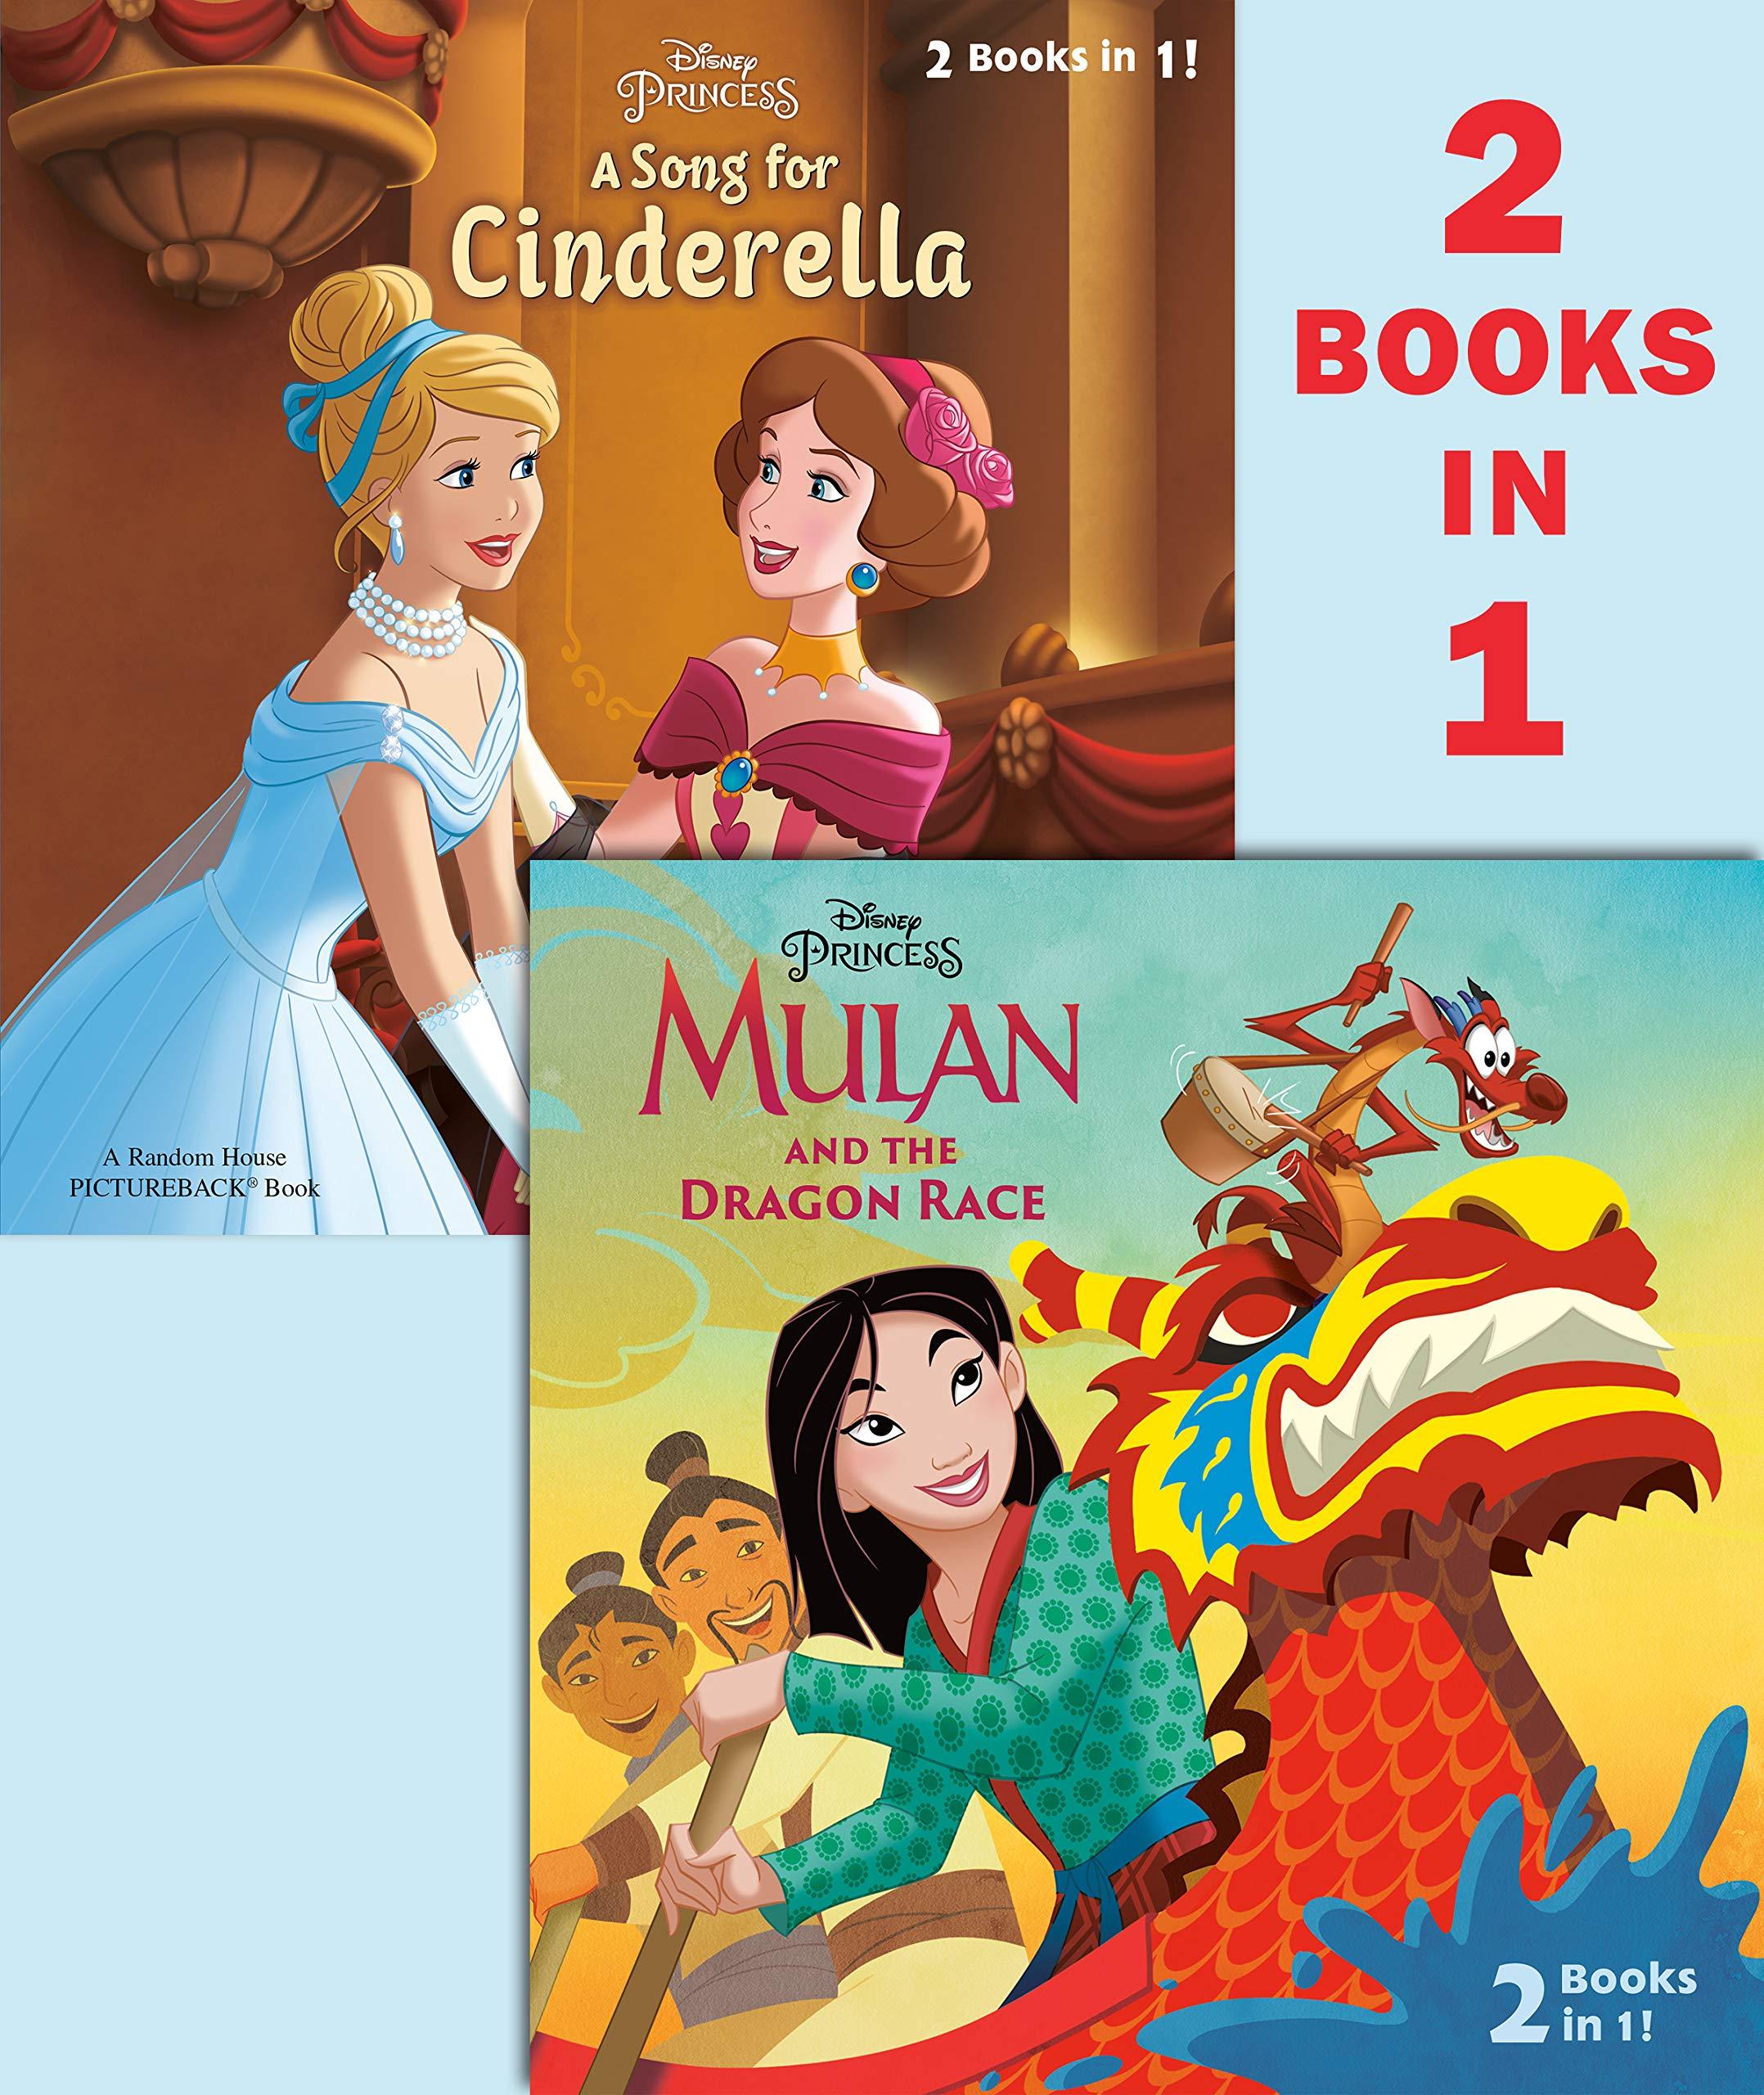 Mulan And The Dragon Race A Song For Cinderella Disney Princess Pictureback R Random House Random House 9780736441209 Amazon Com Books